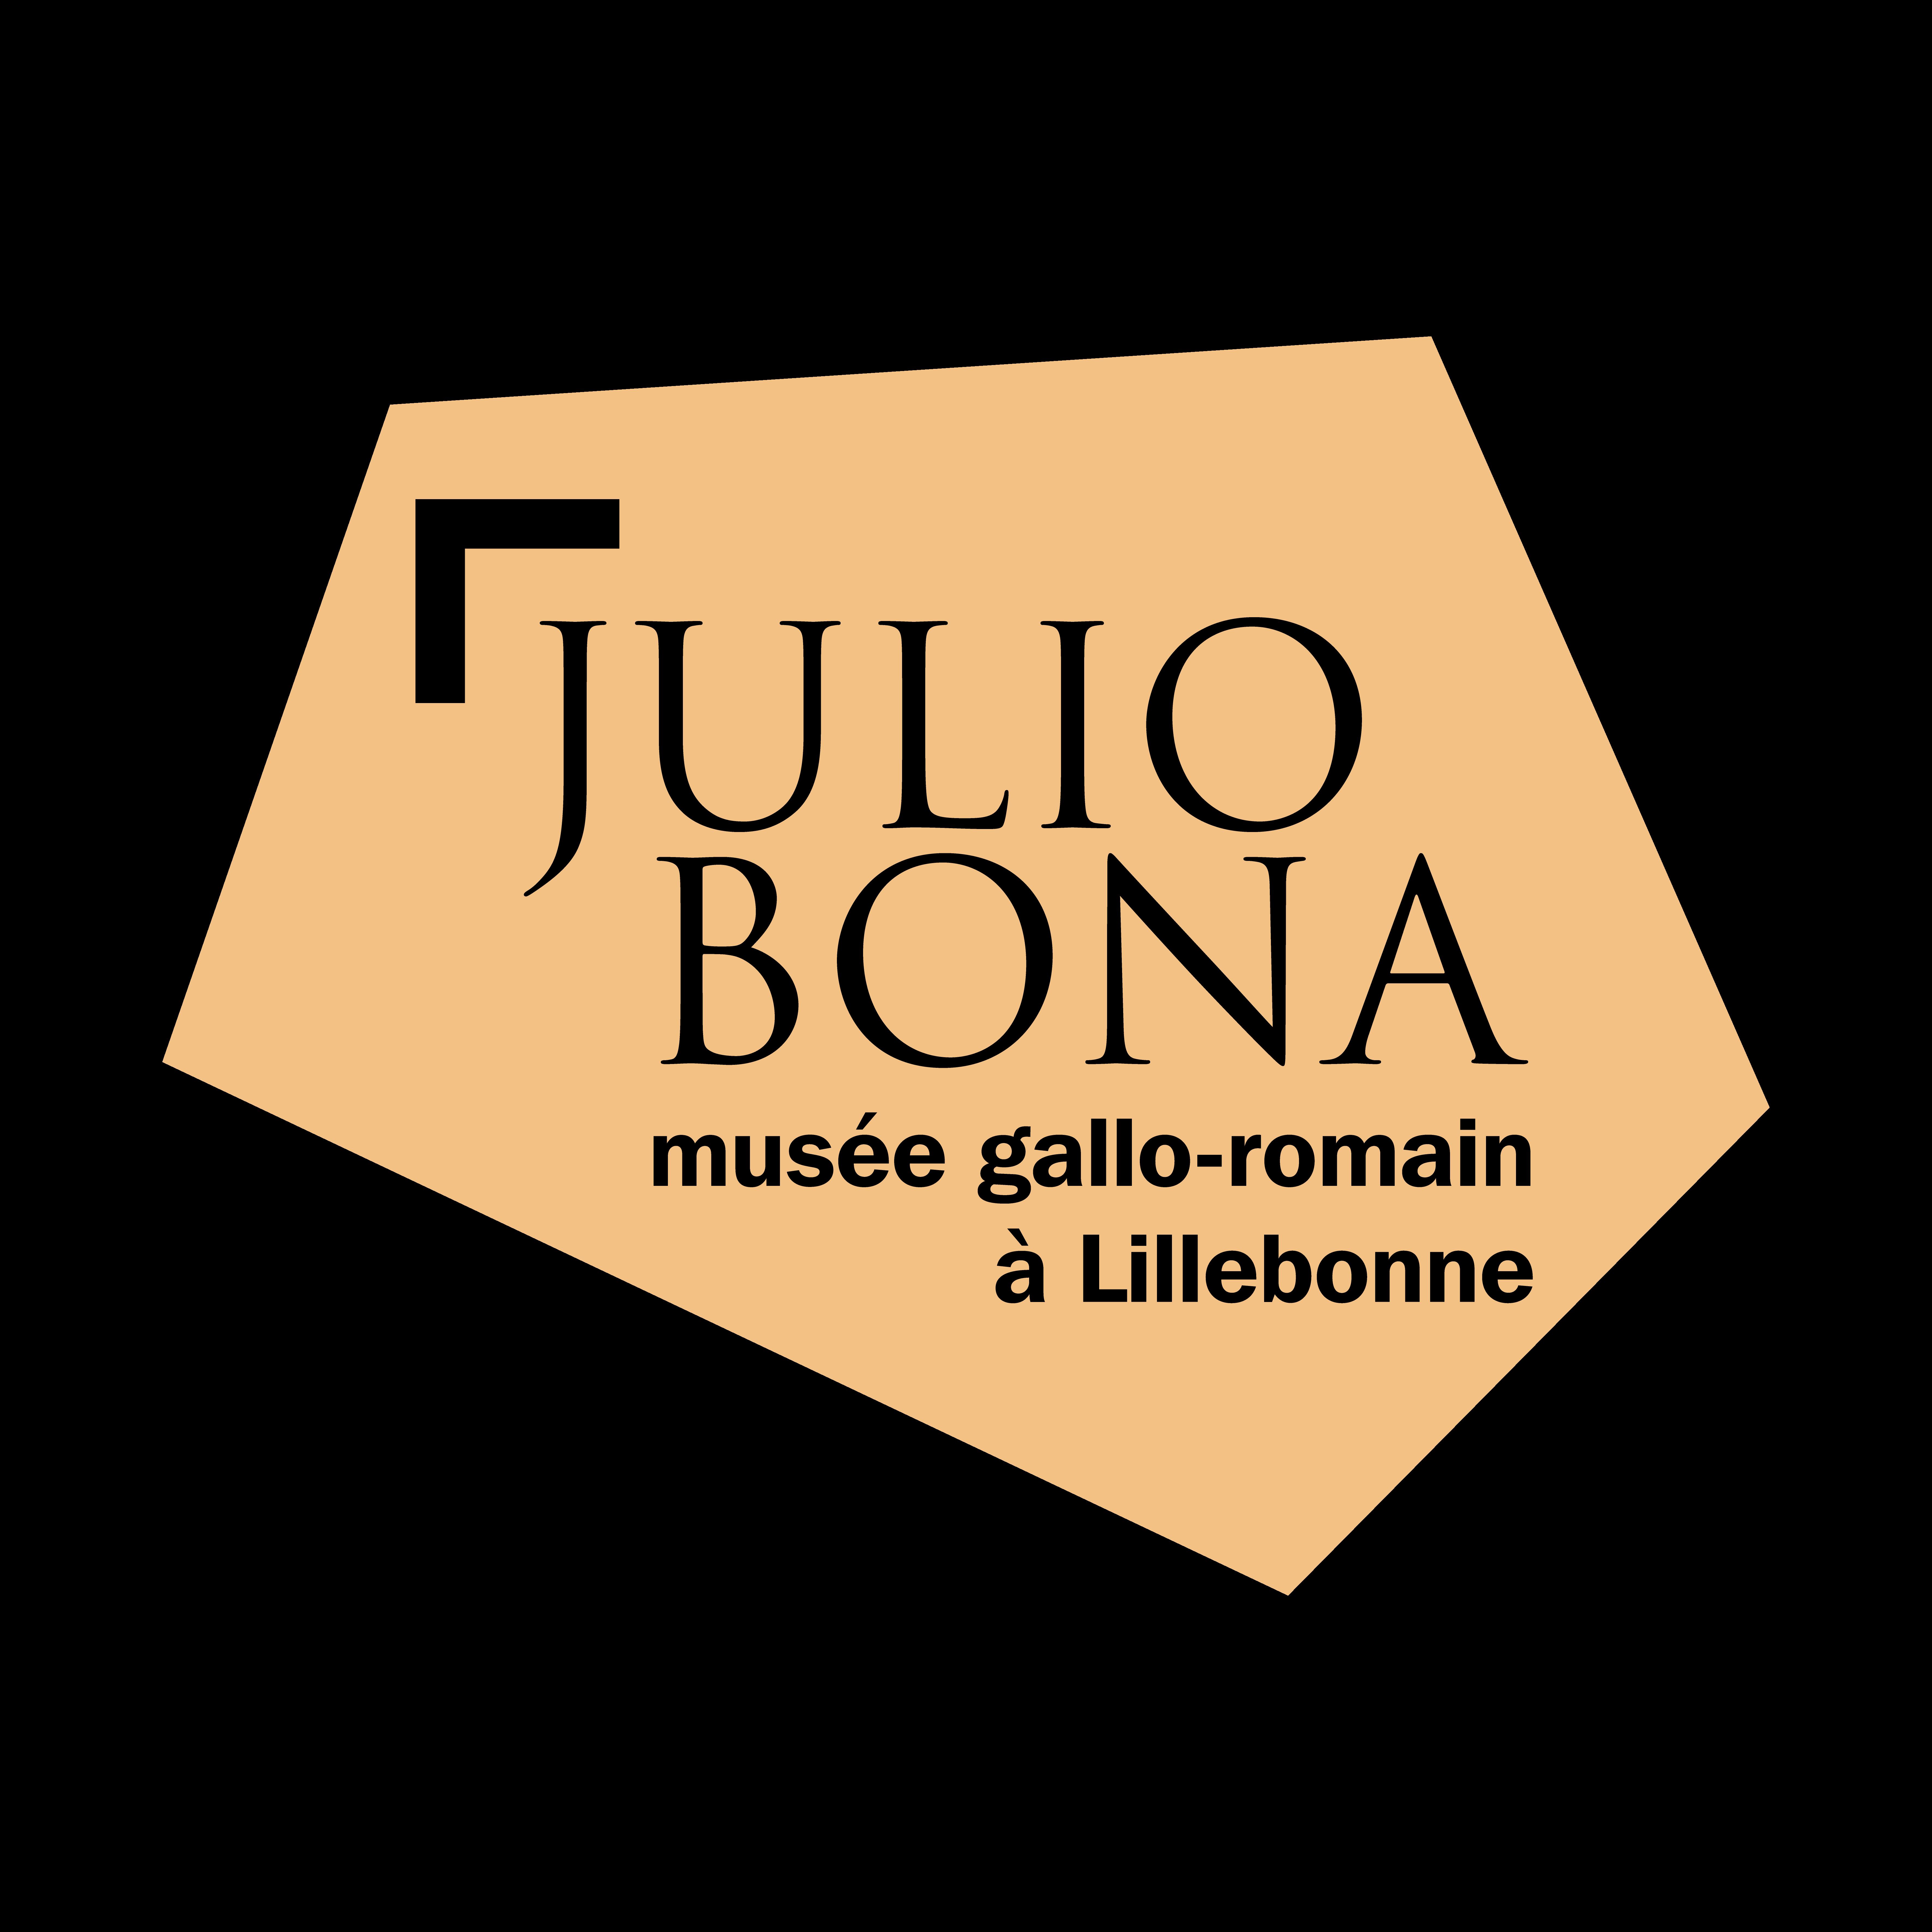 Juliobonna - Musée gallo-romain à Lillebonne